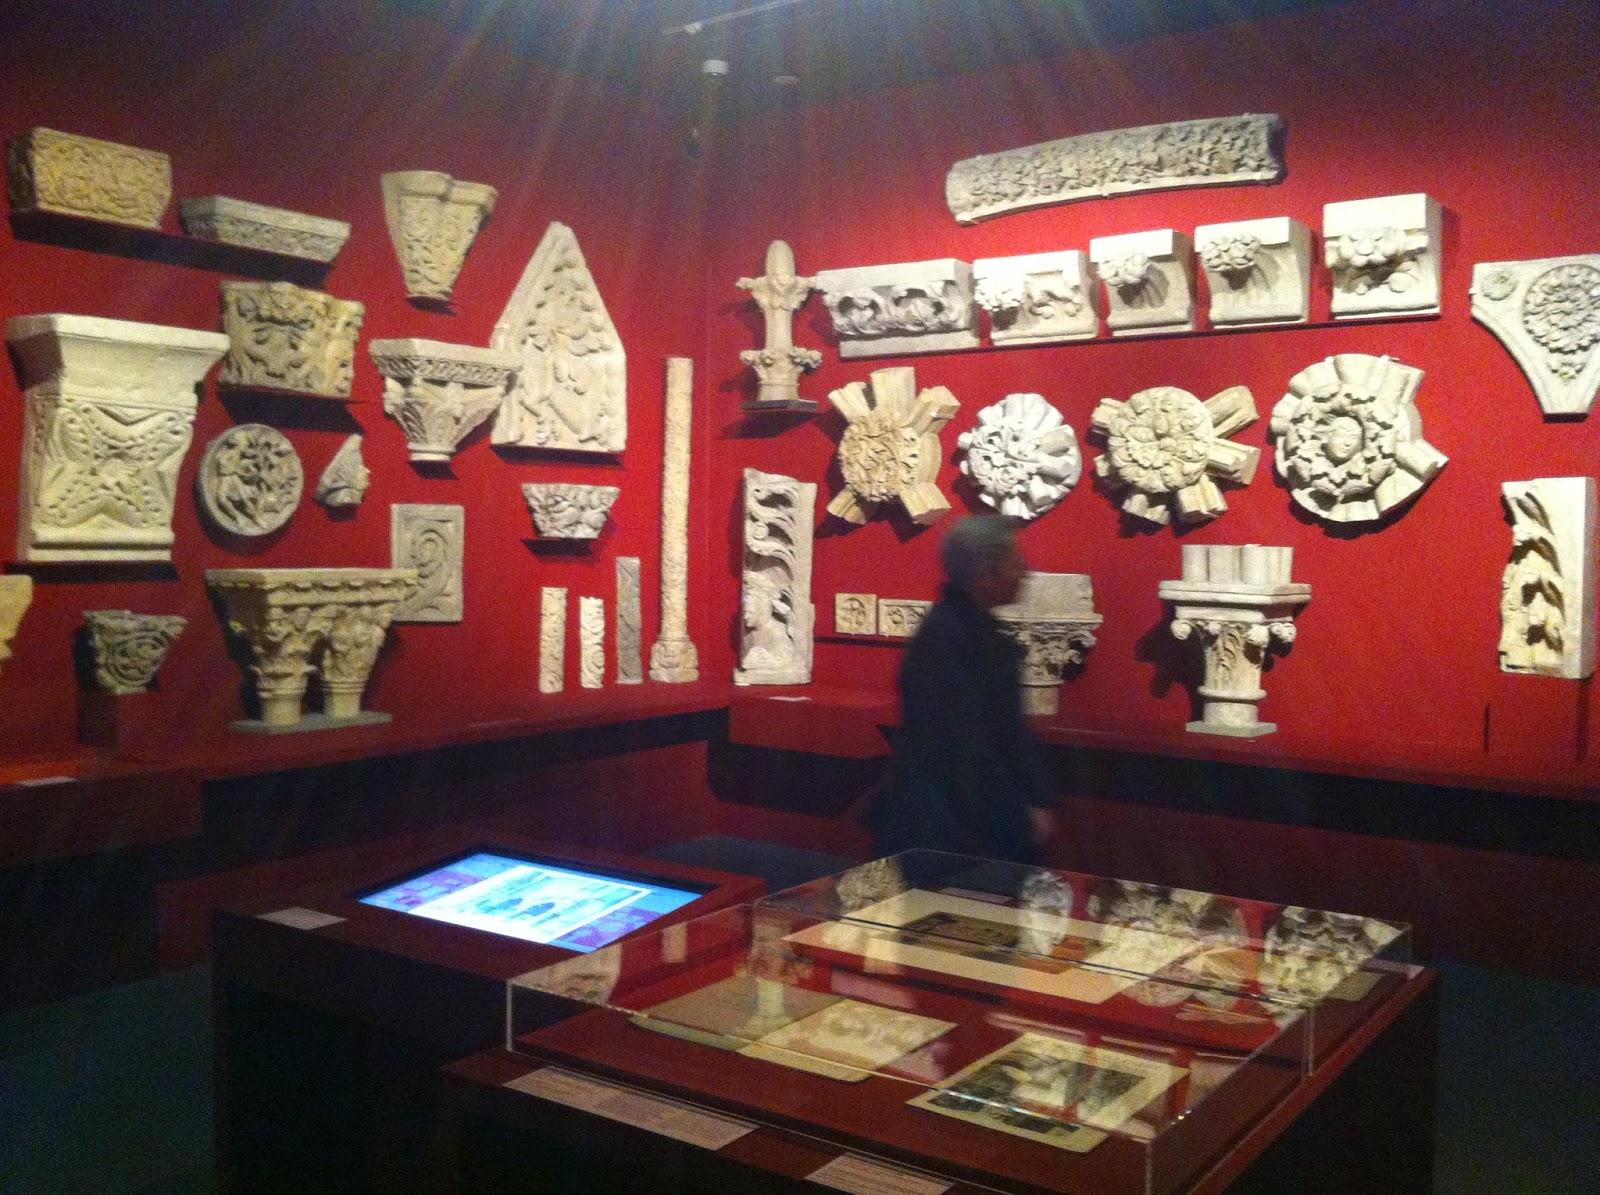 Aperçu du musée de la sculpture comparée